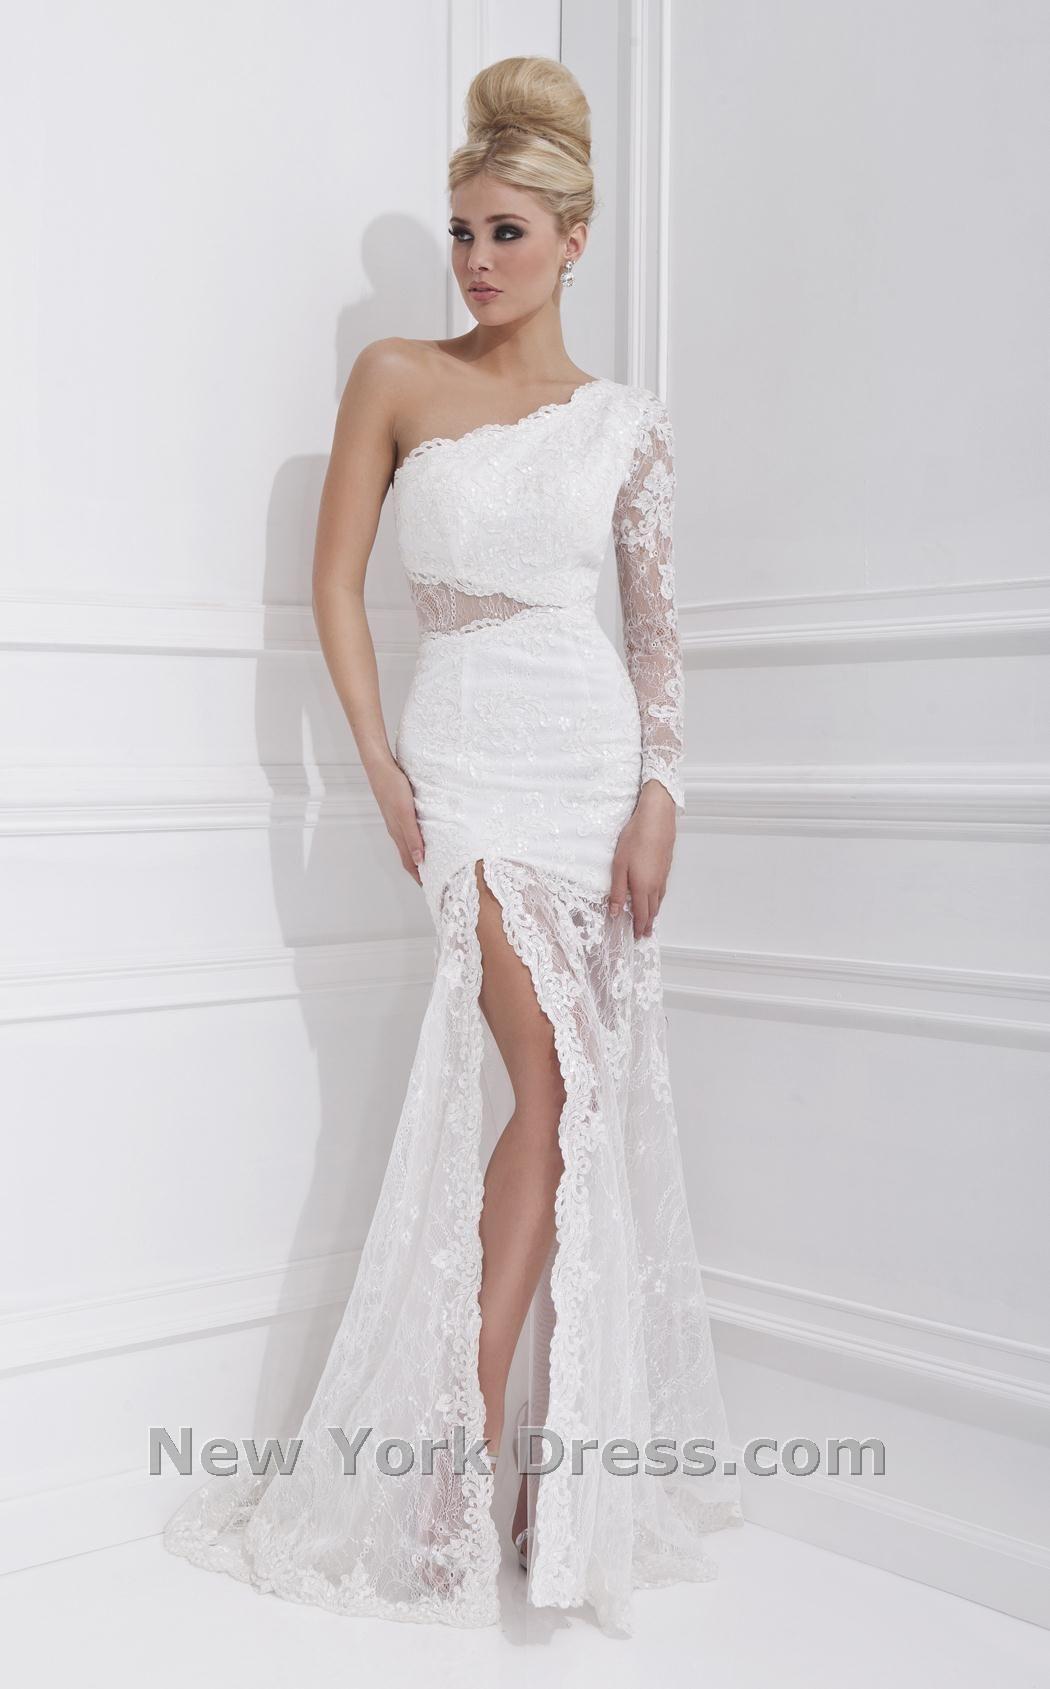 Tony Bowls TBE11456 Dress - NewYorkDress.com | My dresses ...